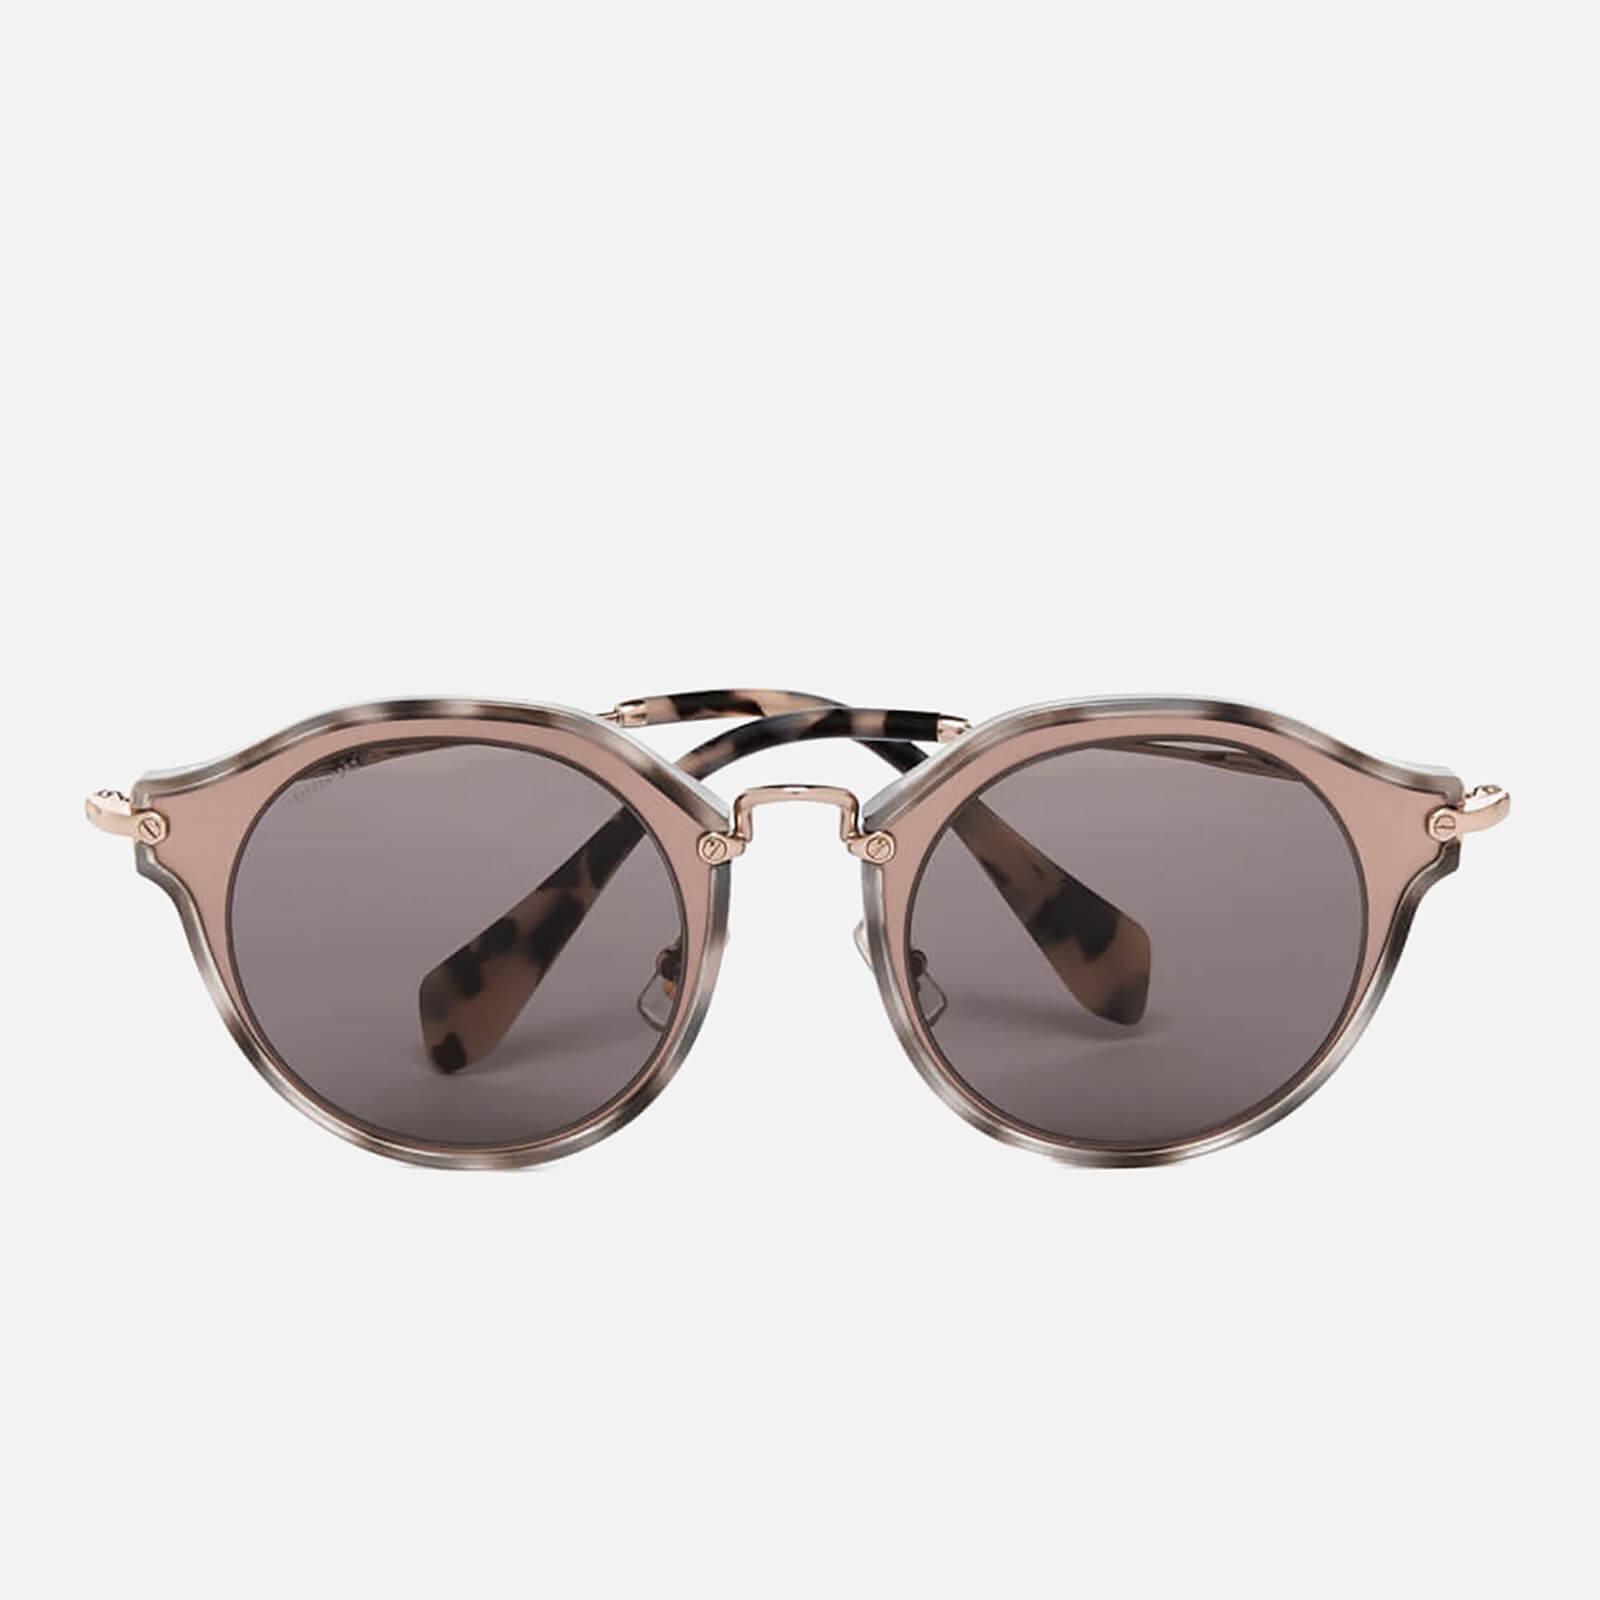 bde5b57510f0 Miu Miu Women's Noir Metal Rim Frame Sunglasses - Matte Pink - Free UK  Delivery over £50